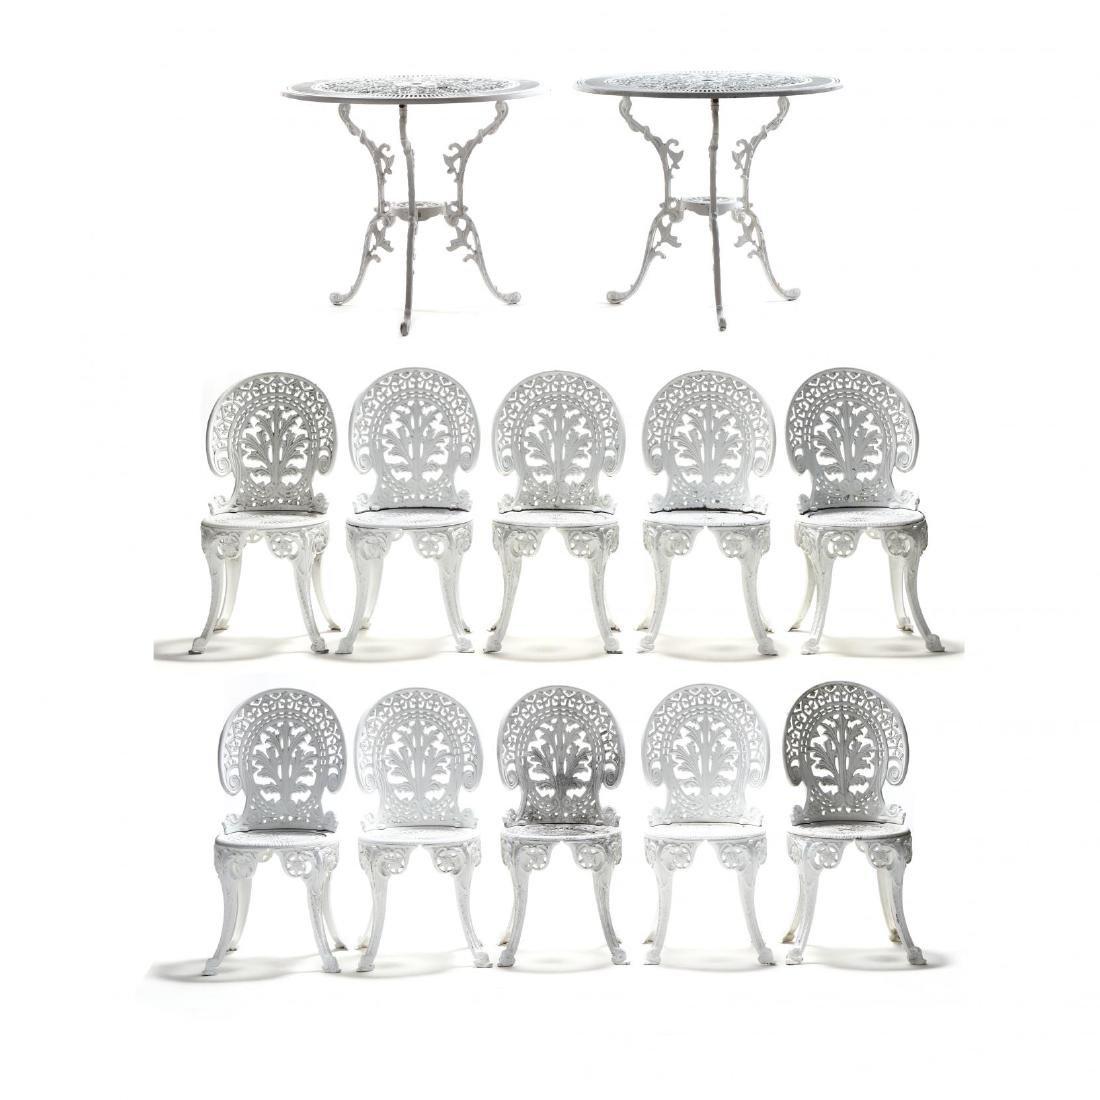 Twelve Piece Classical Style Cast Aluminum Garden Set